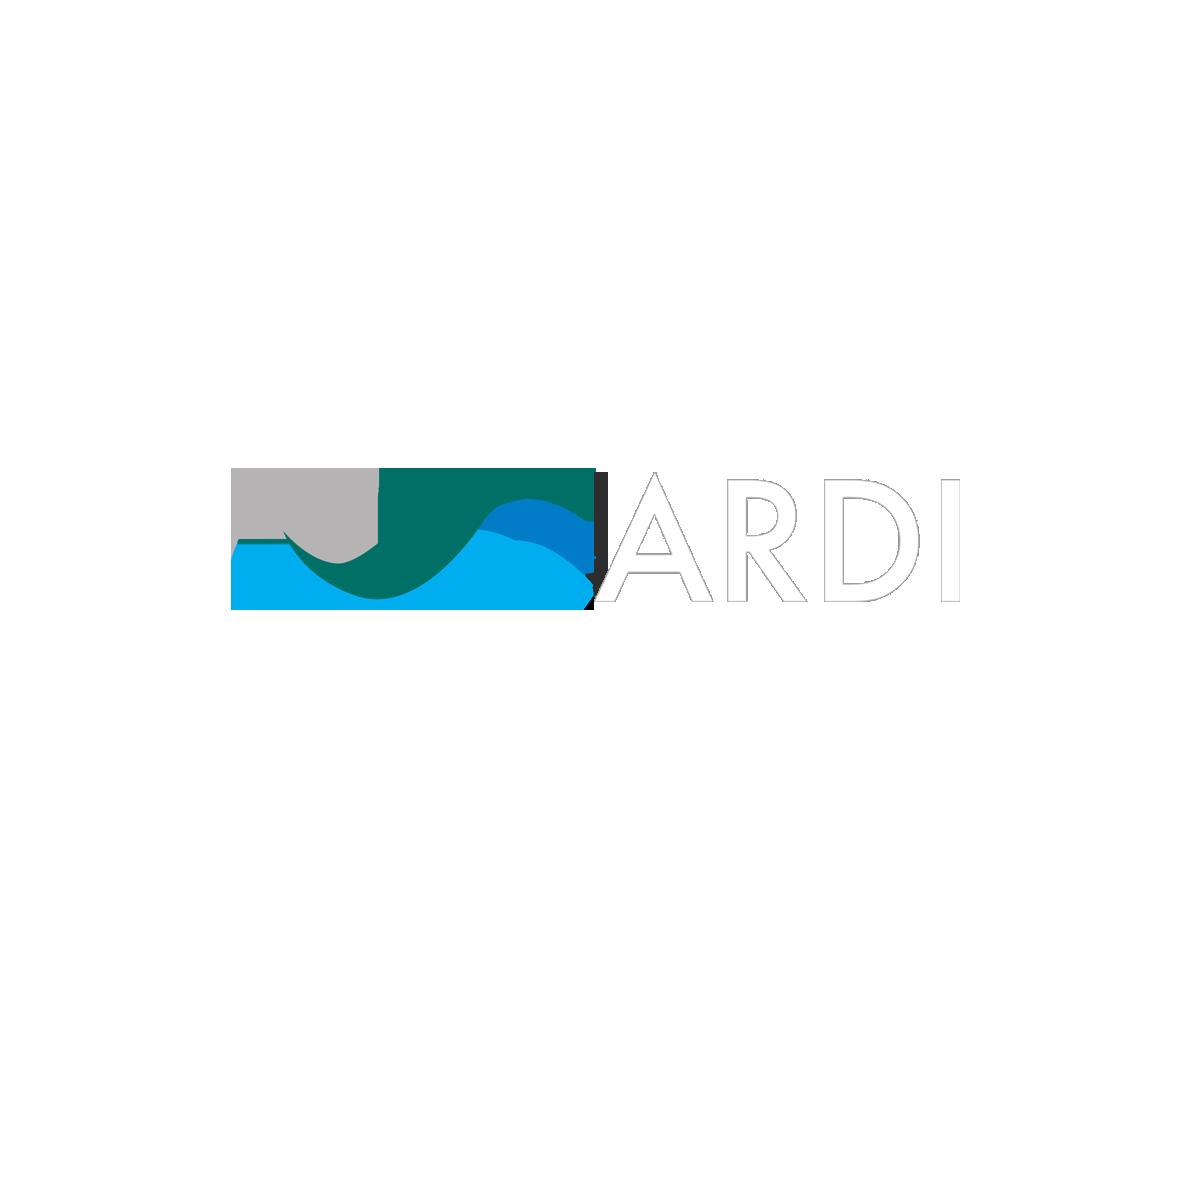 ARDI-LOGO copy